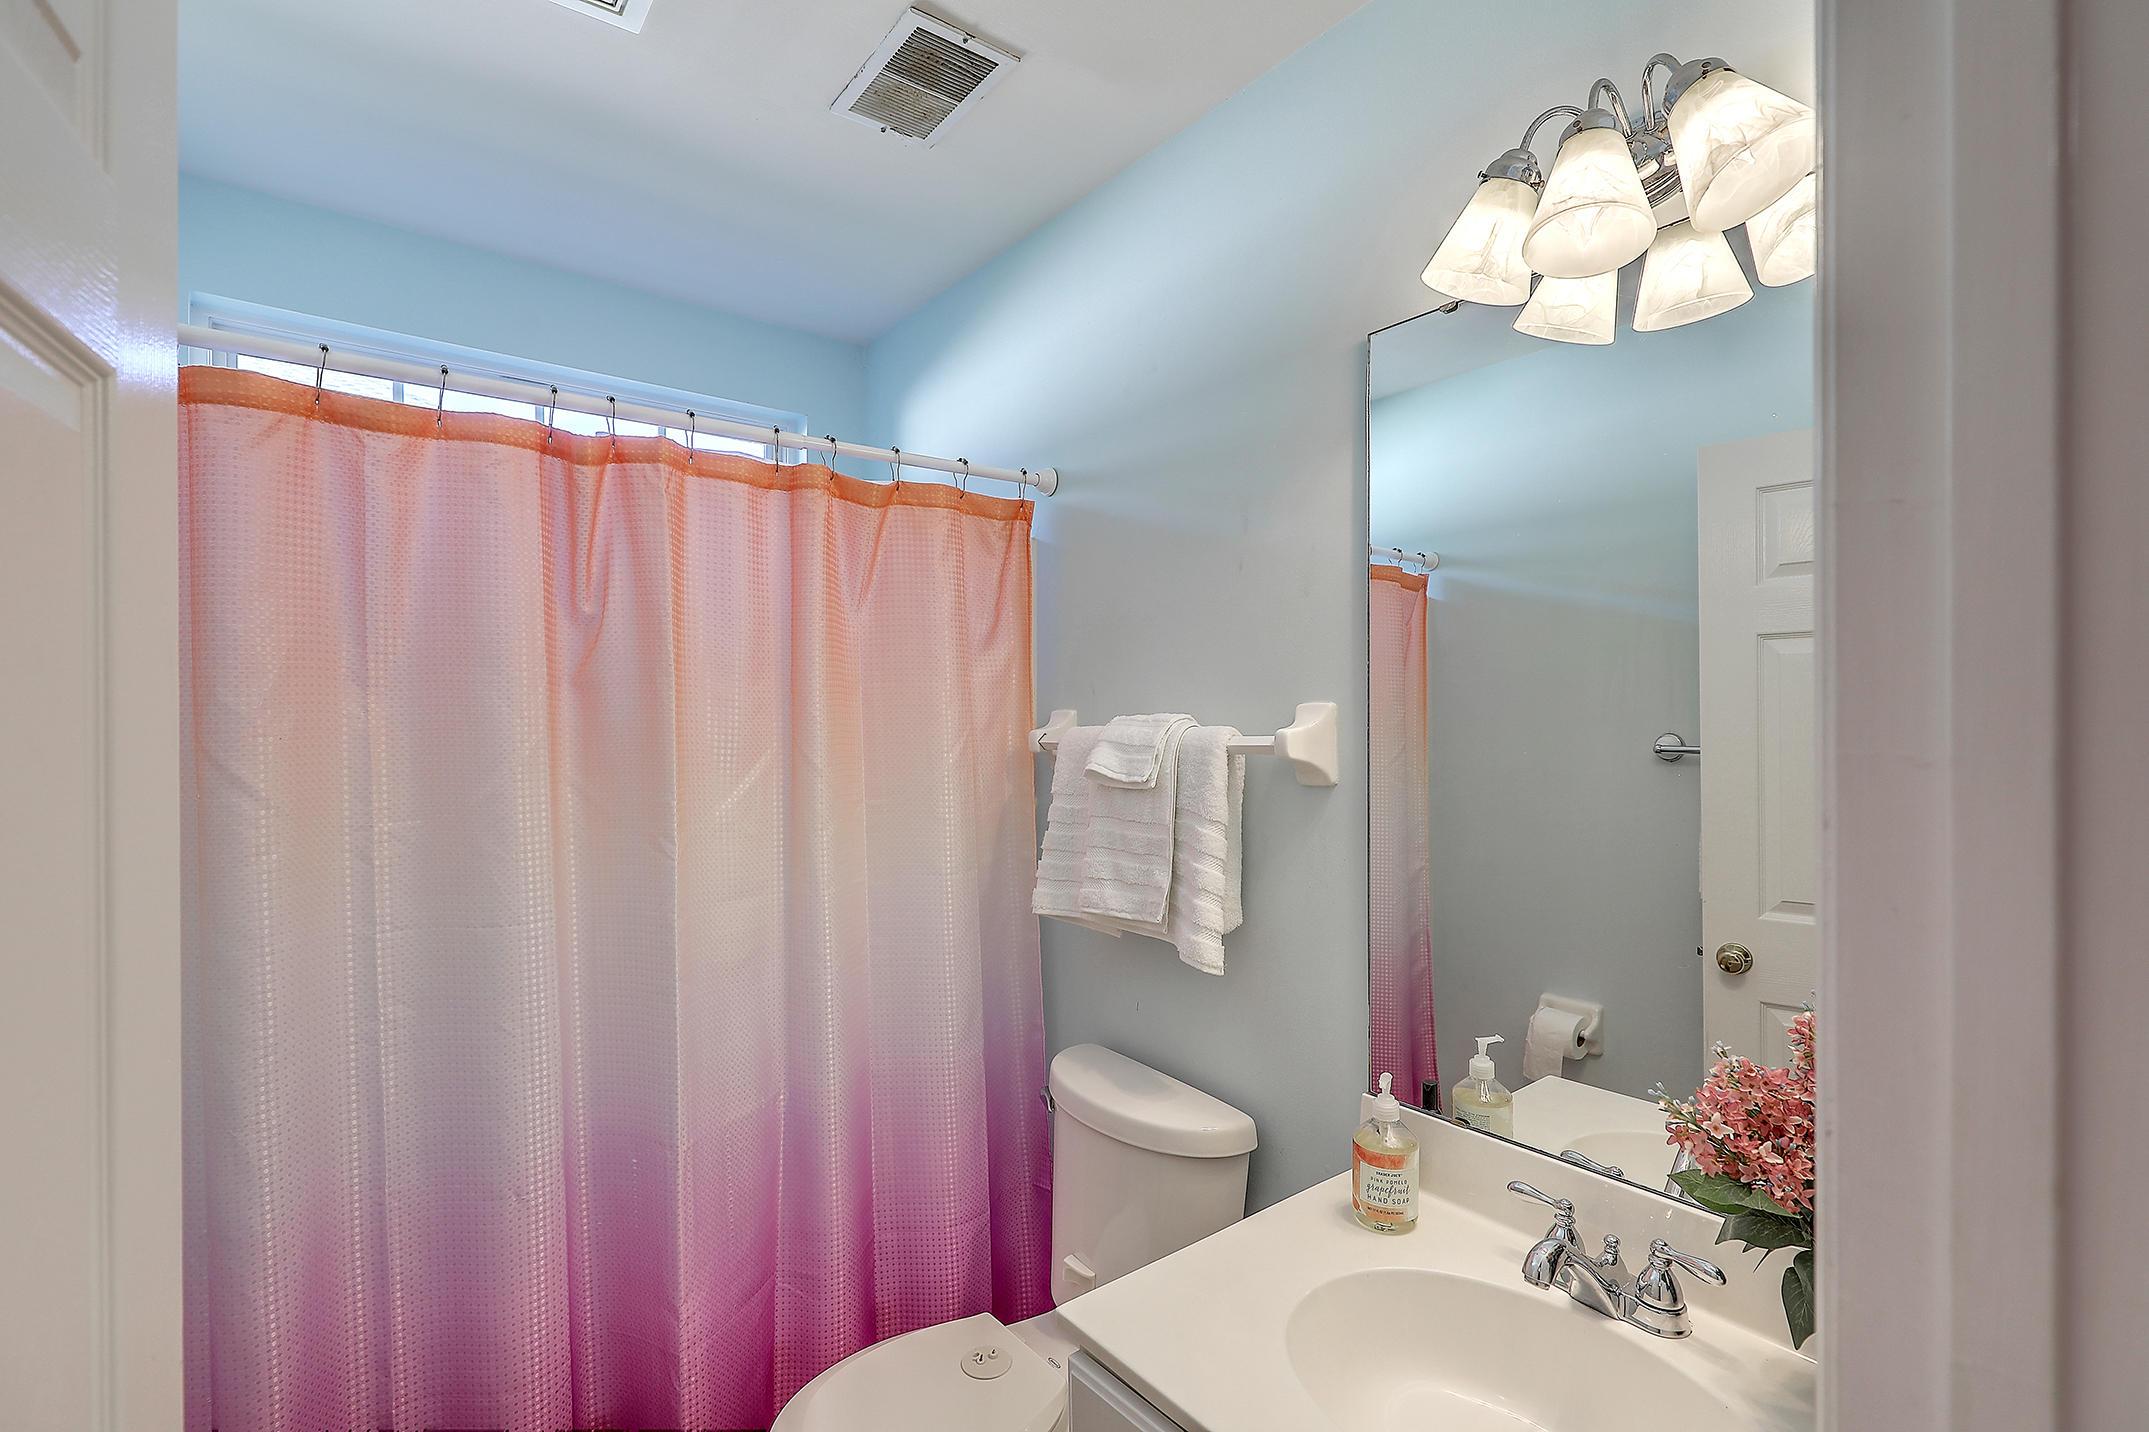 Dunes West Homes For Sale - 1471 Cypress Pointe, Mount Pleasant, SC - 35